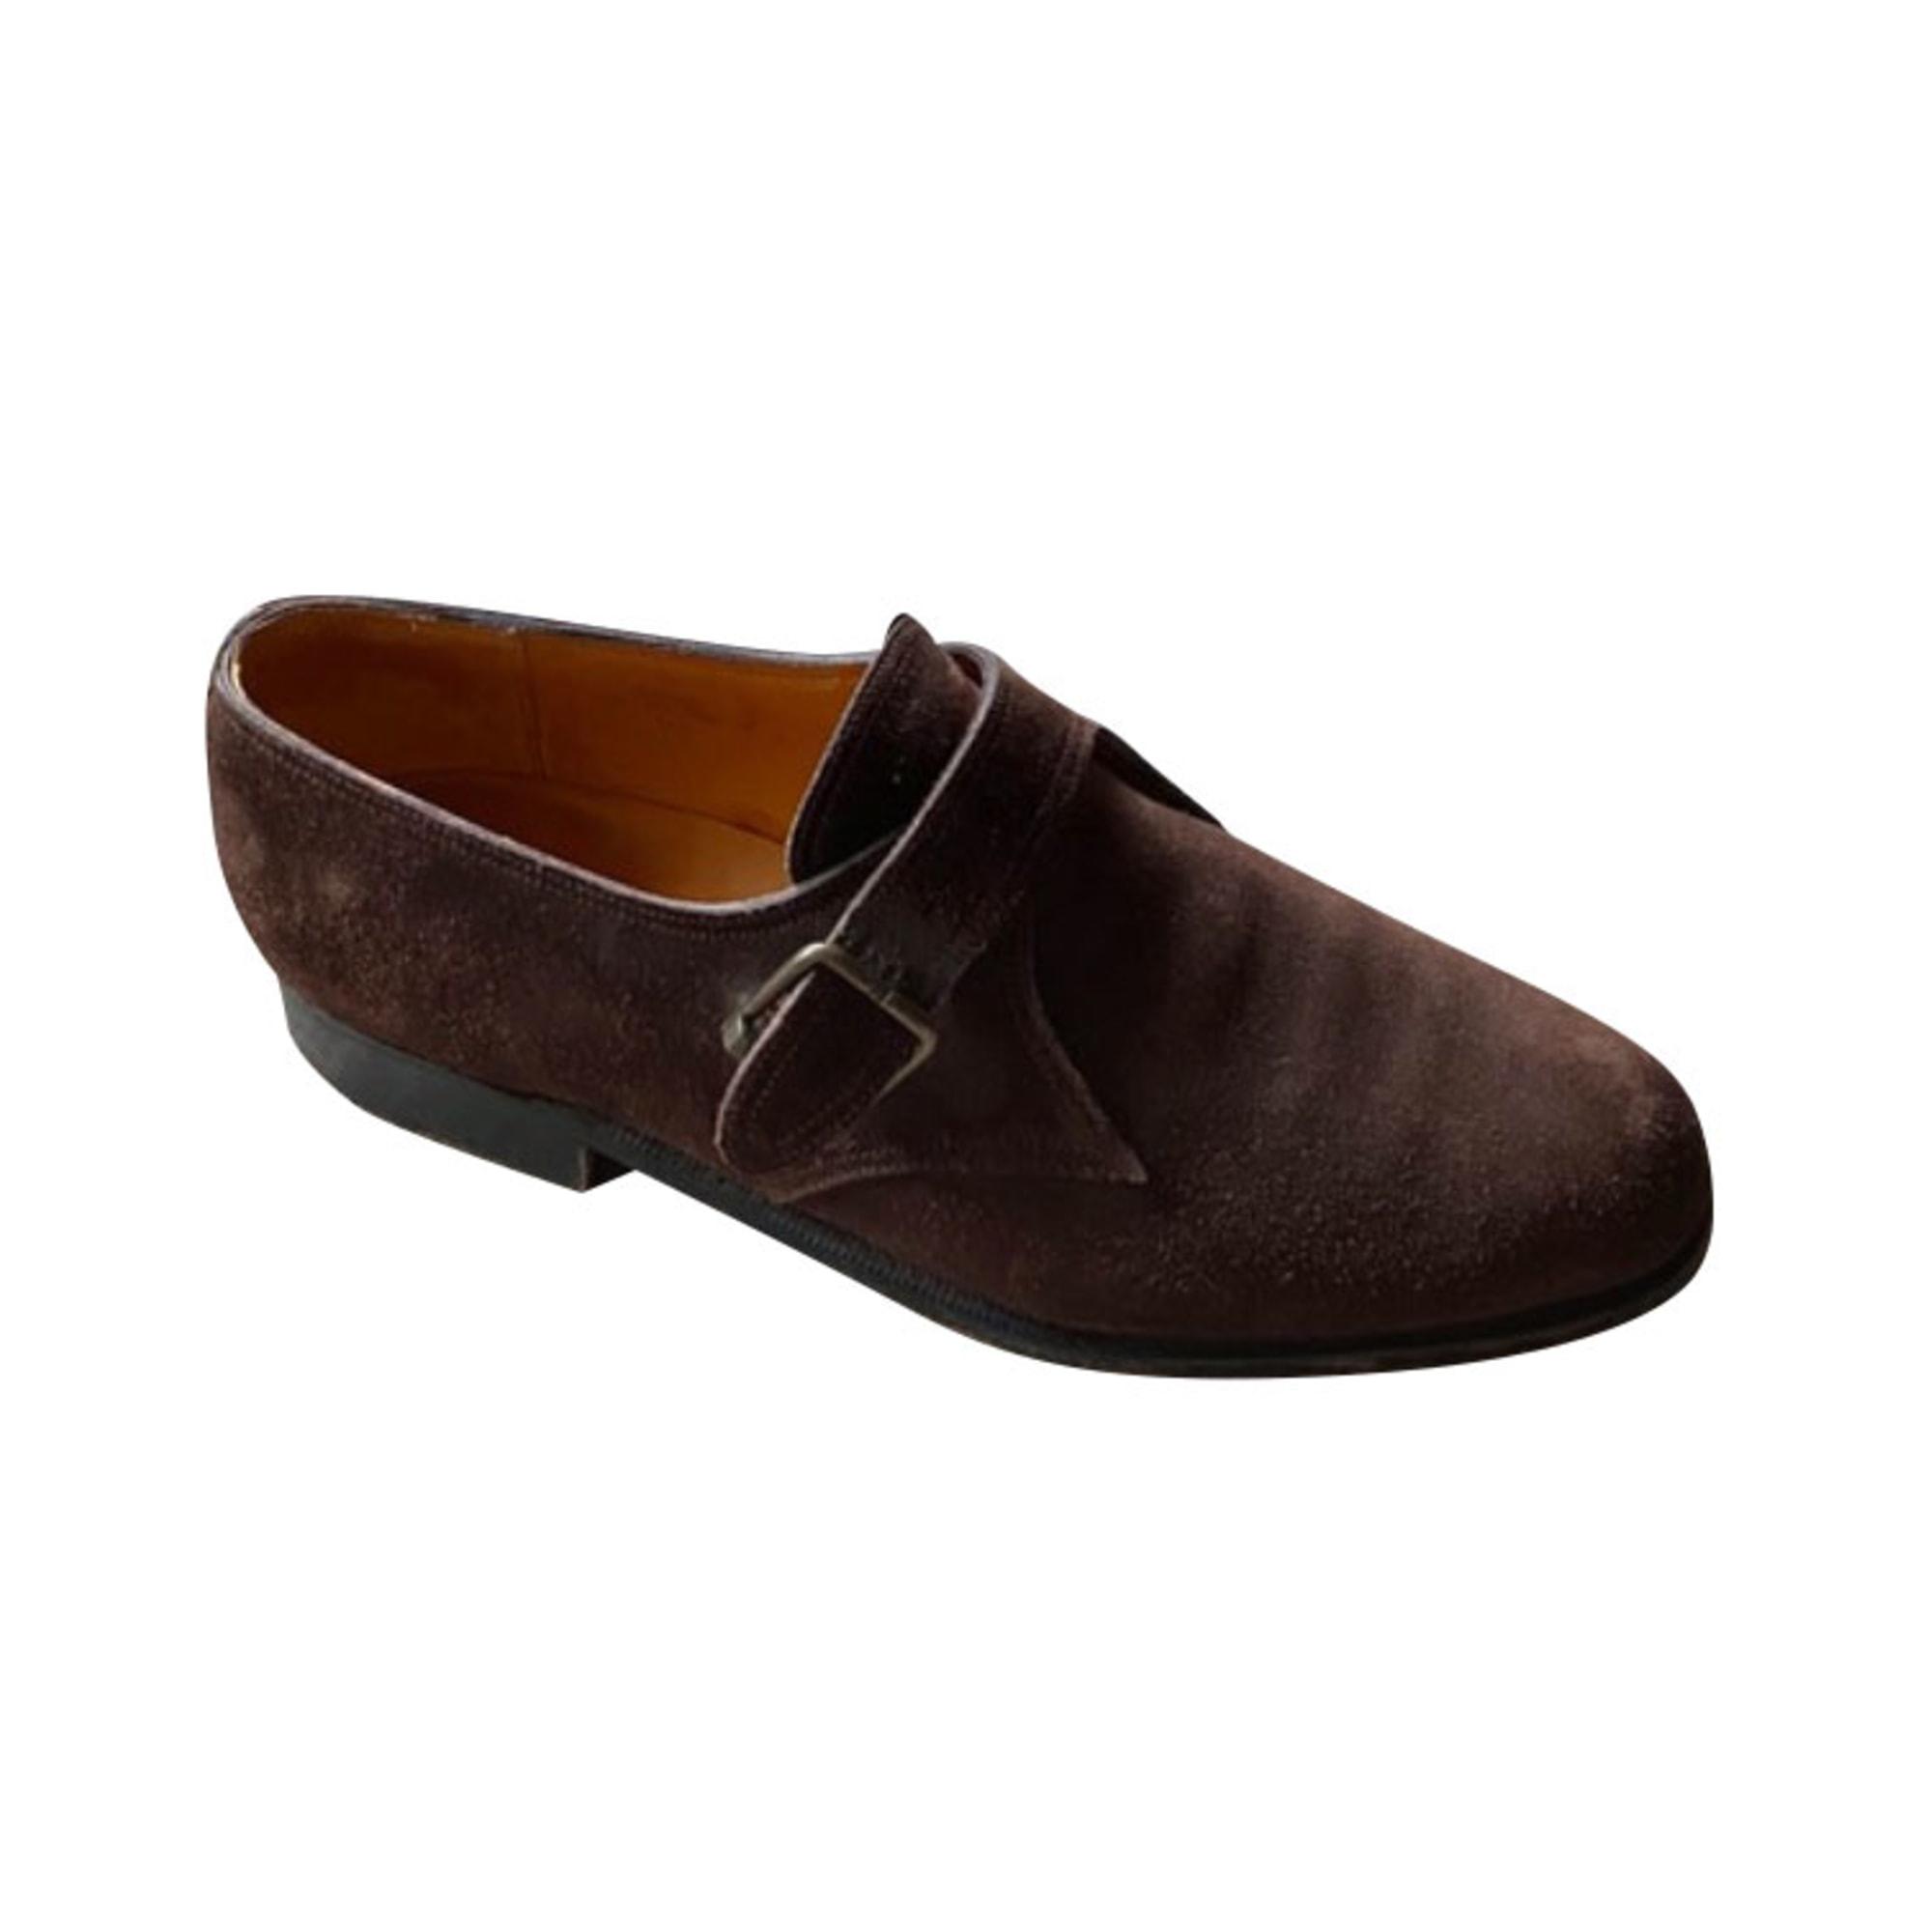 Buckle Shoes JM WESTON Brown